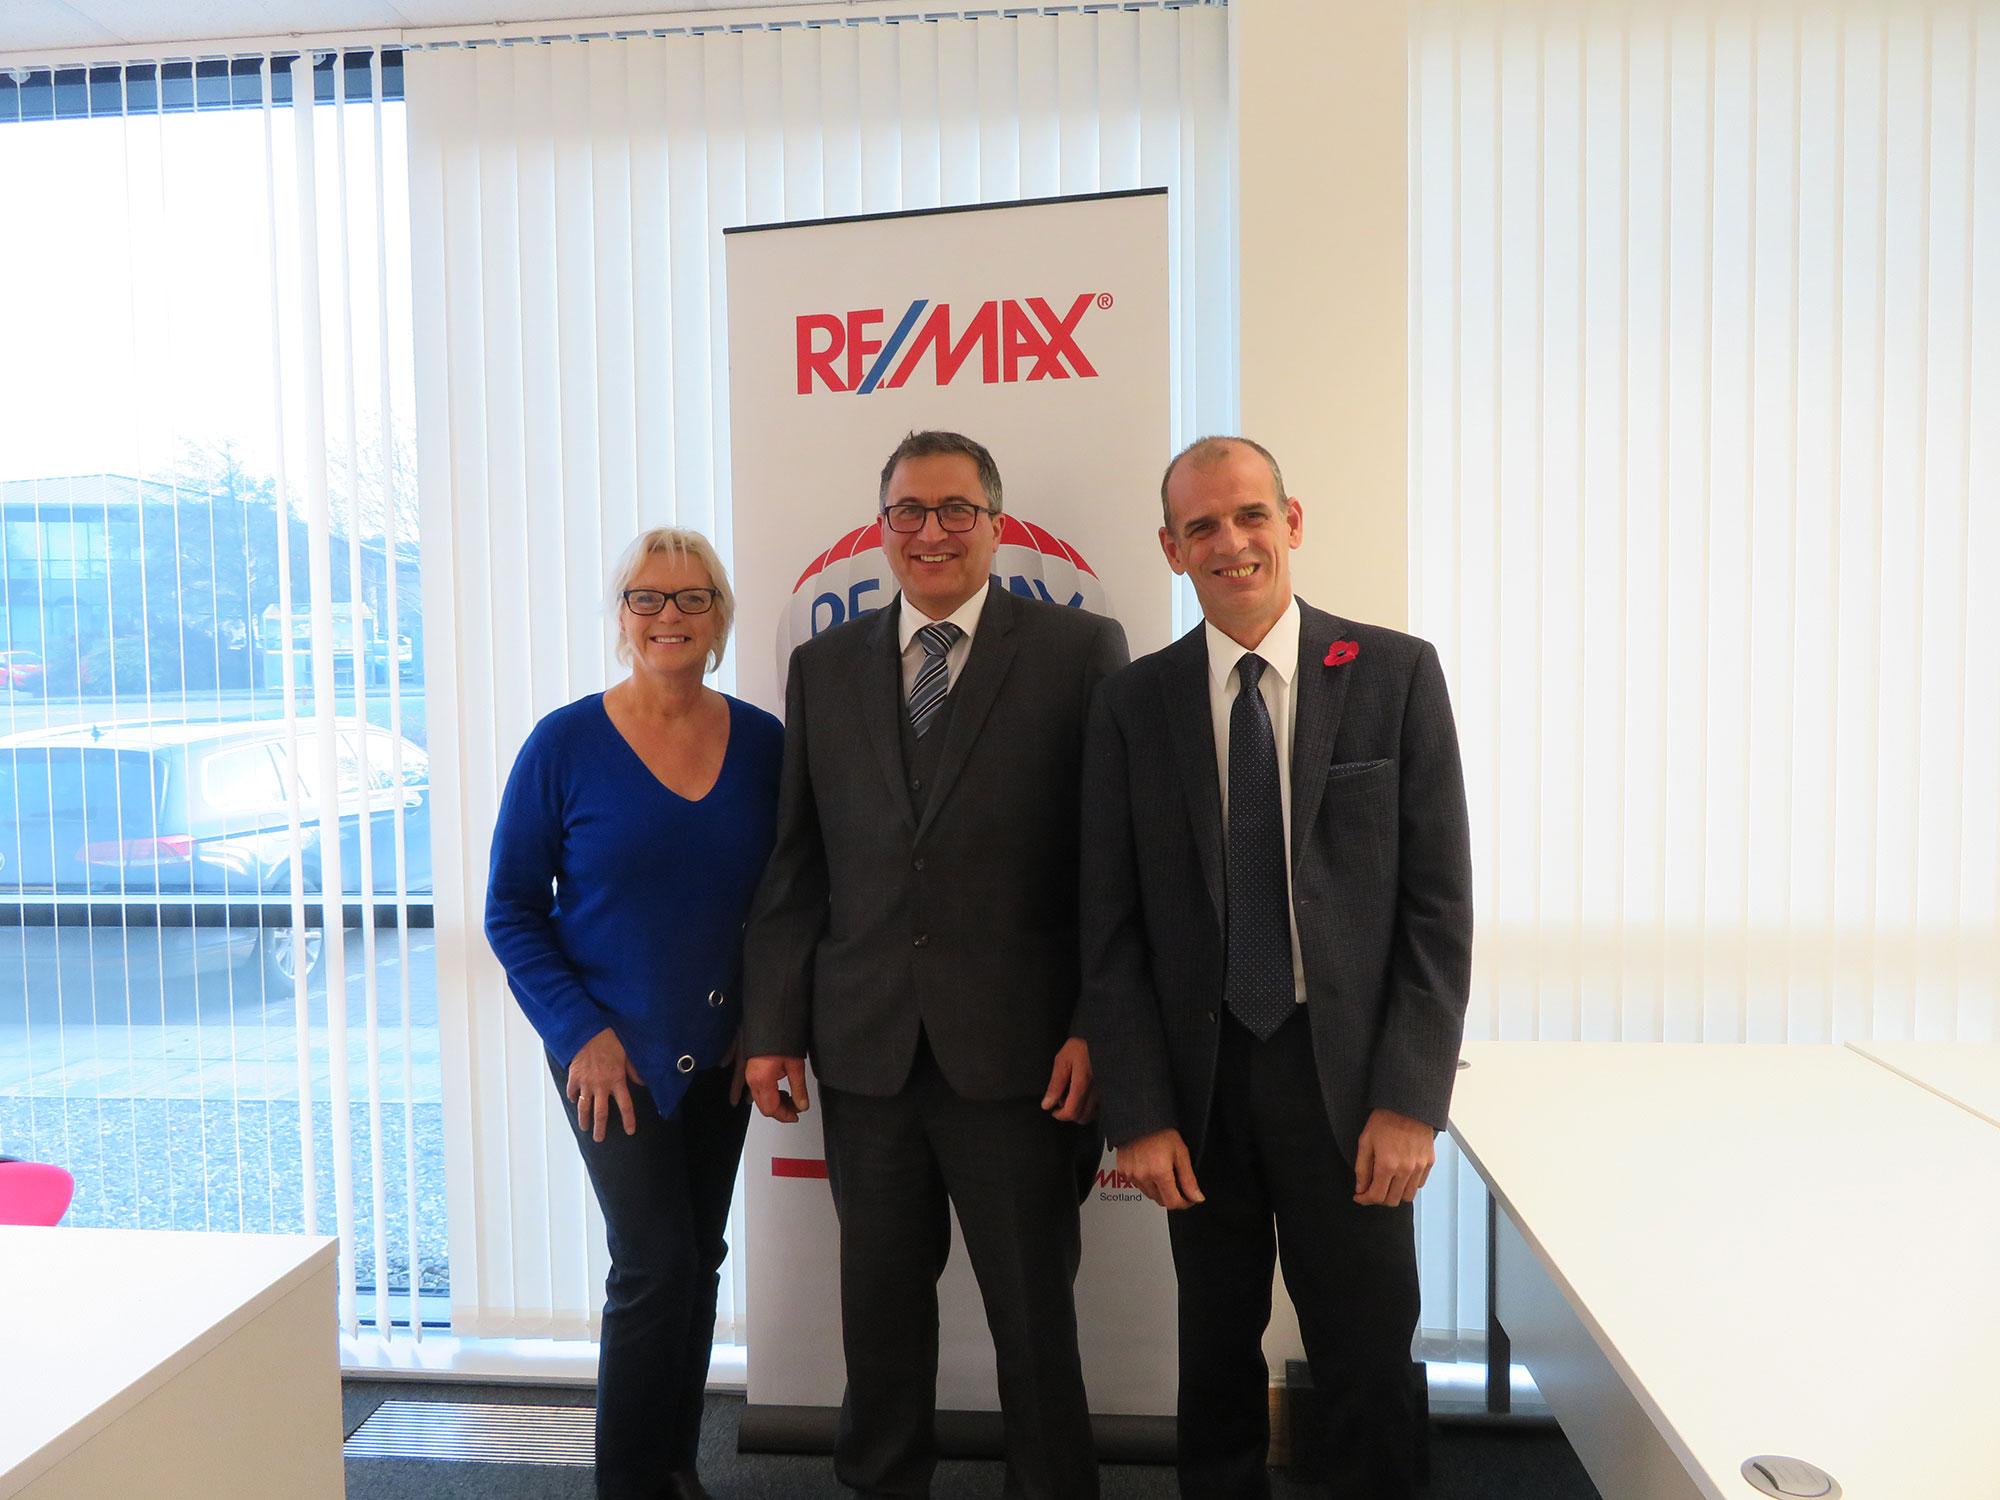 Remax-team-photo-low